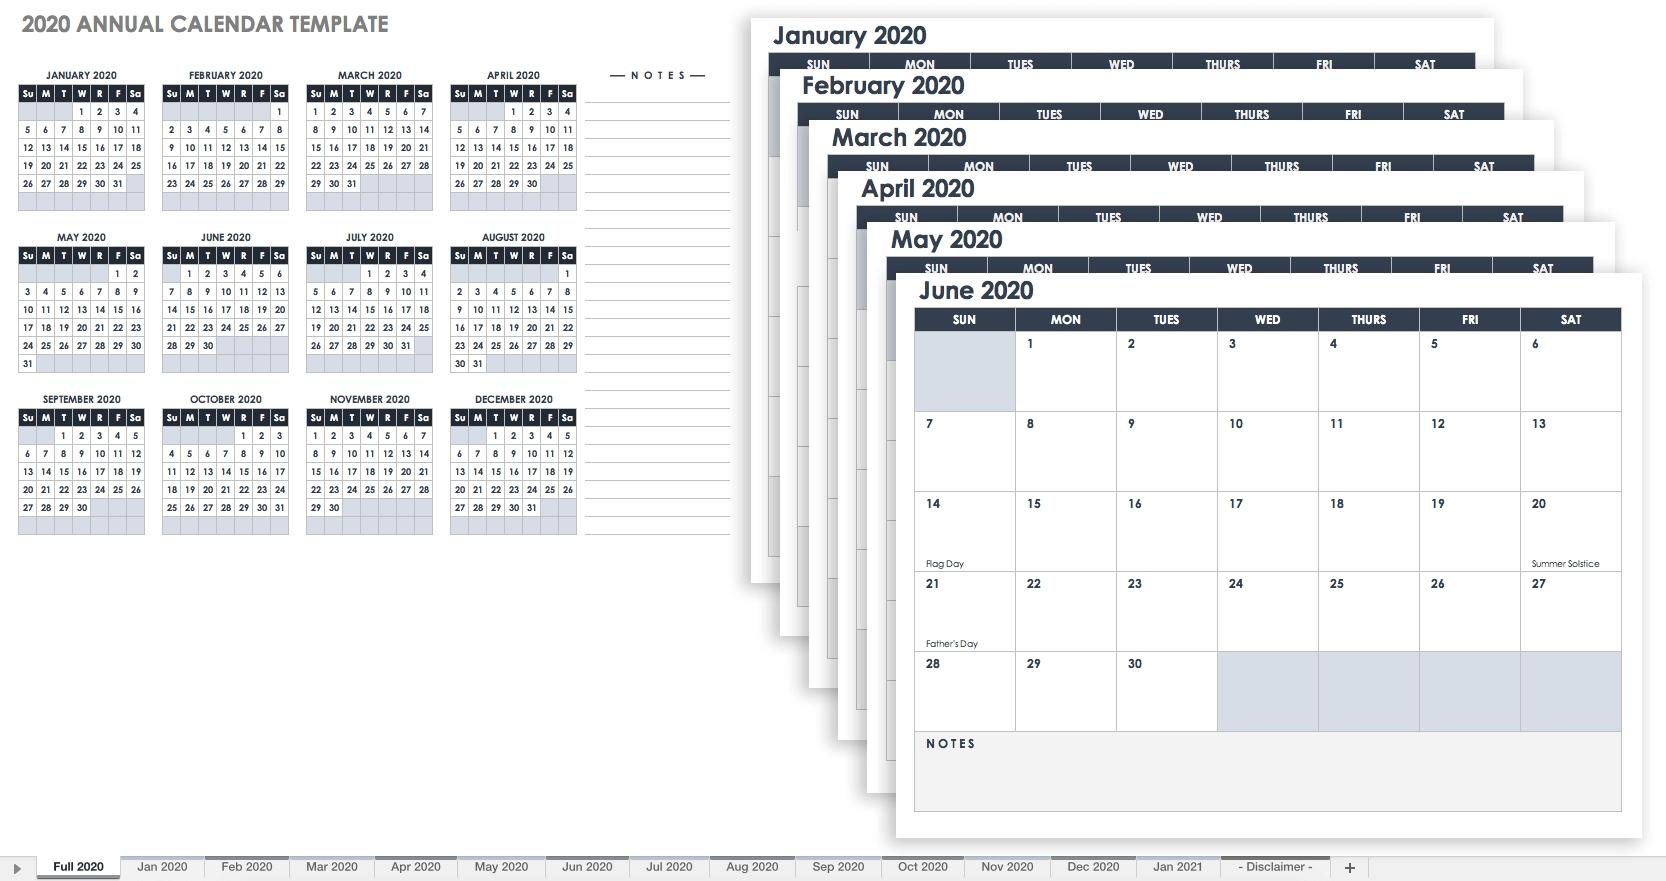 Free Blank Calendar Templates - Smartsheet regarding One Page Annual Calendar Printable